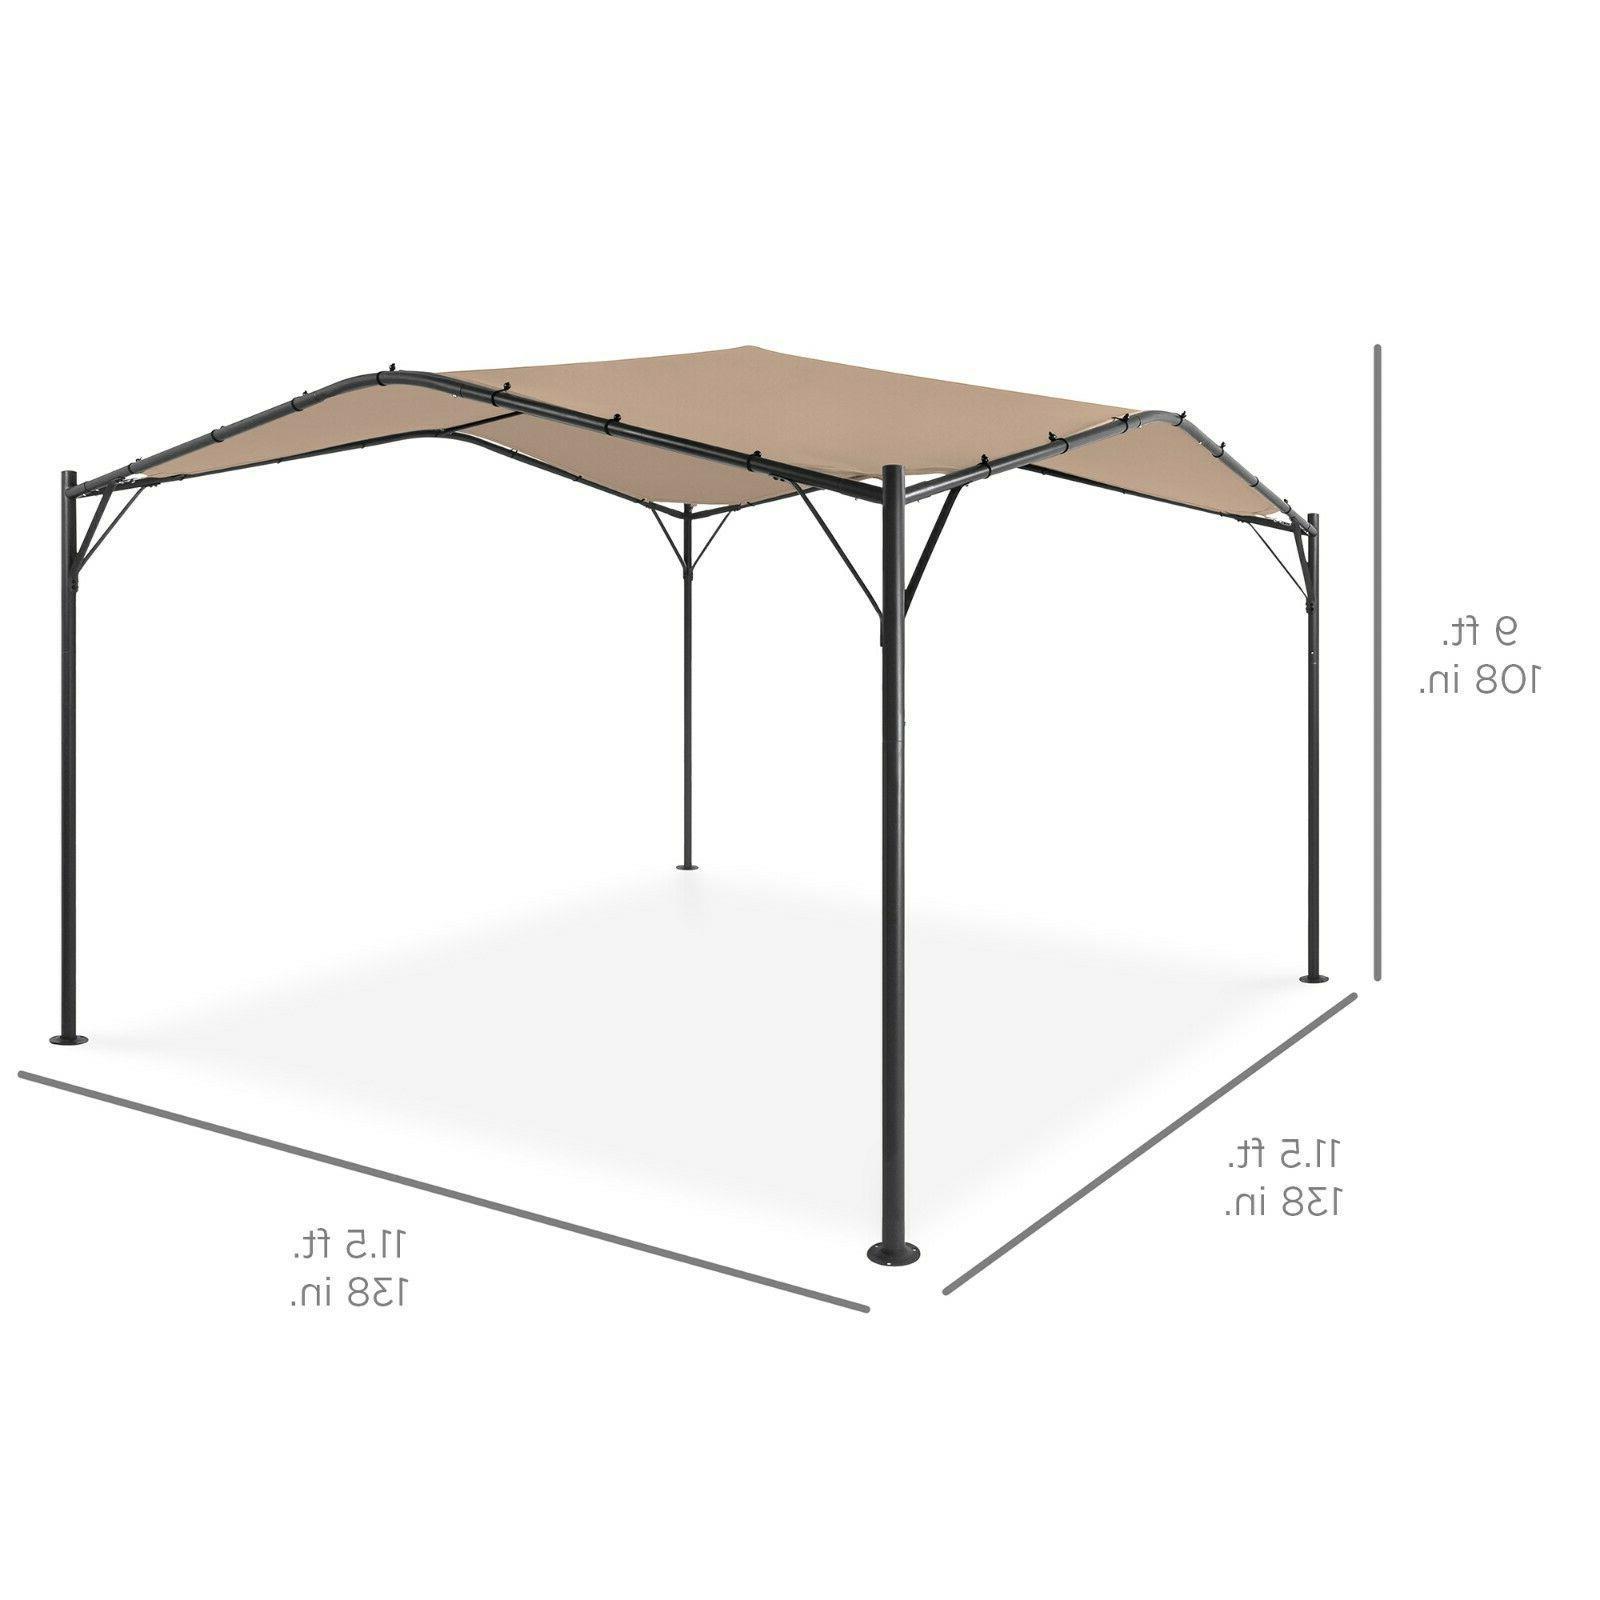 Best Choice Products 12x12ft Gazebo Canopy Backyard Bags